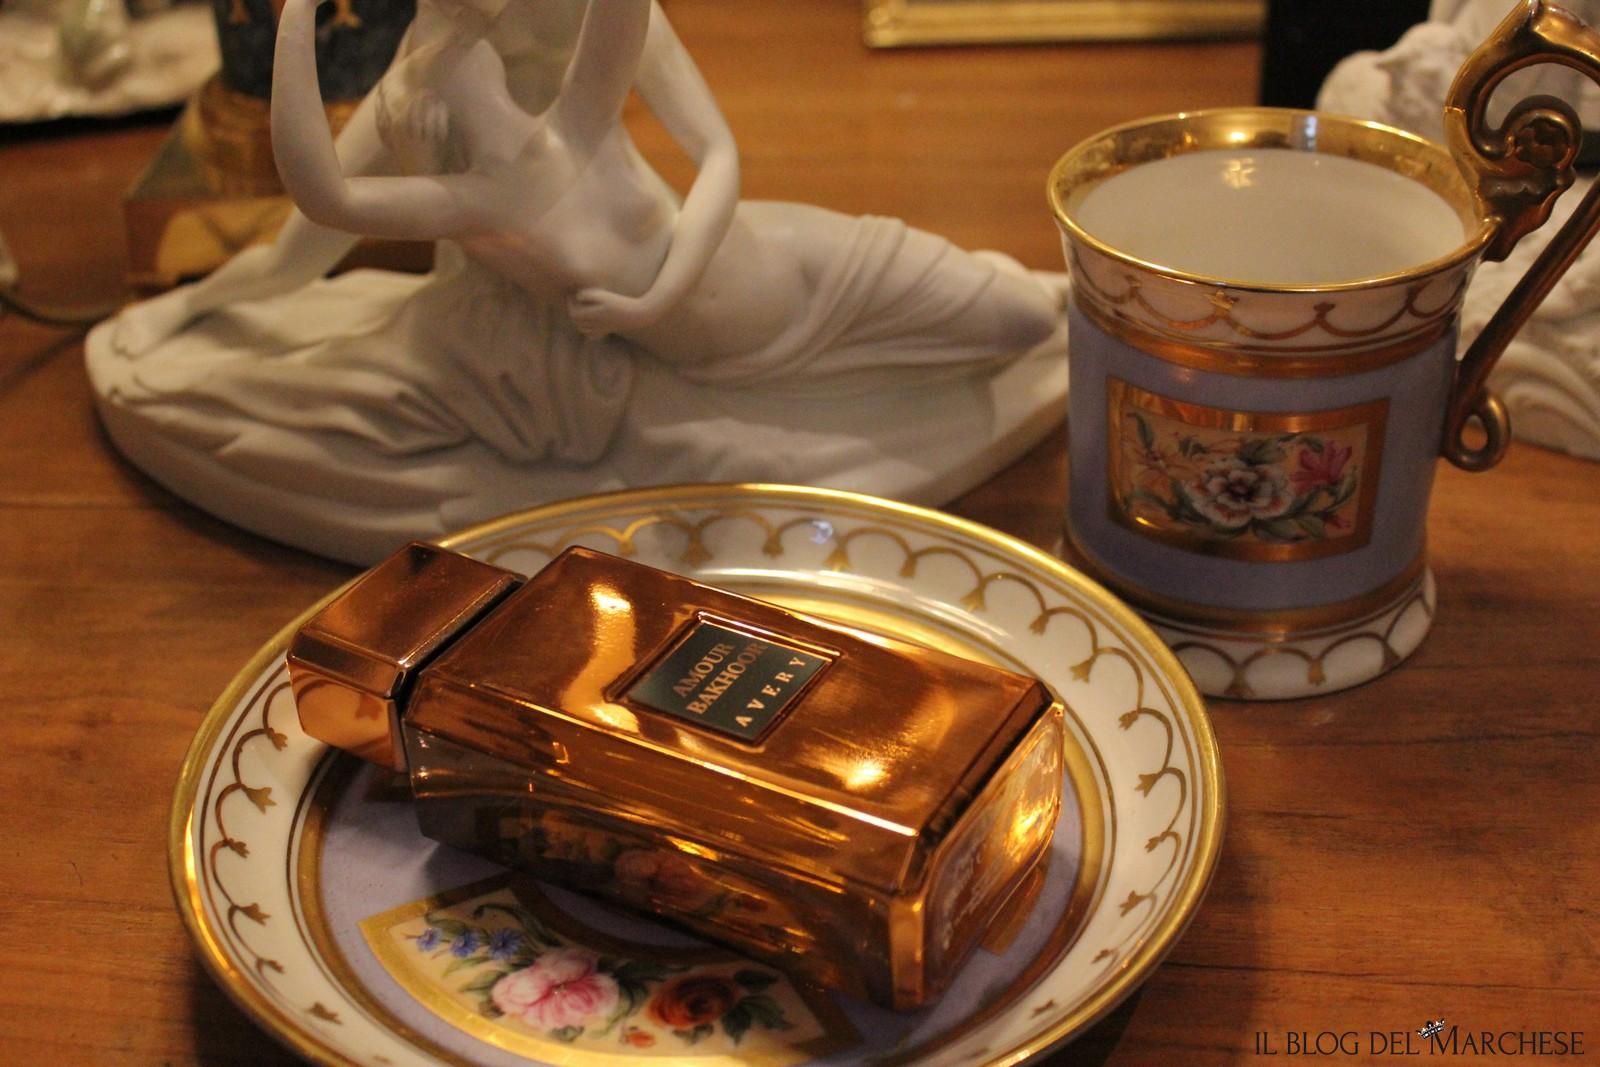 Italian bloggers of perfumes